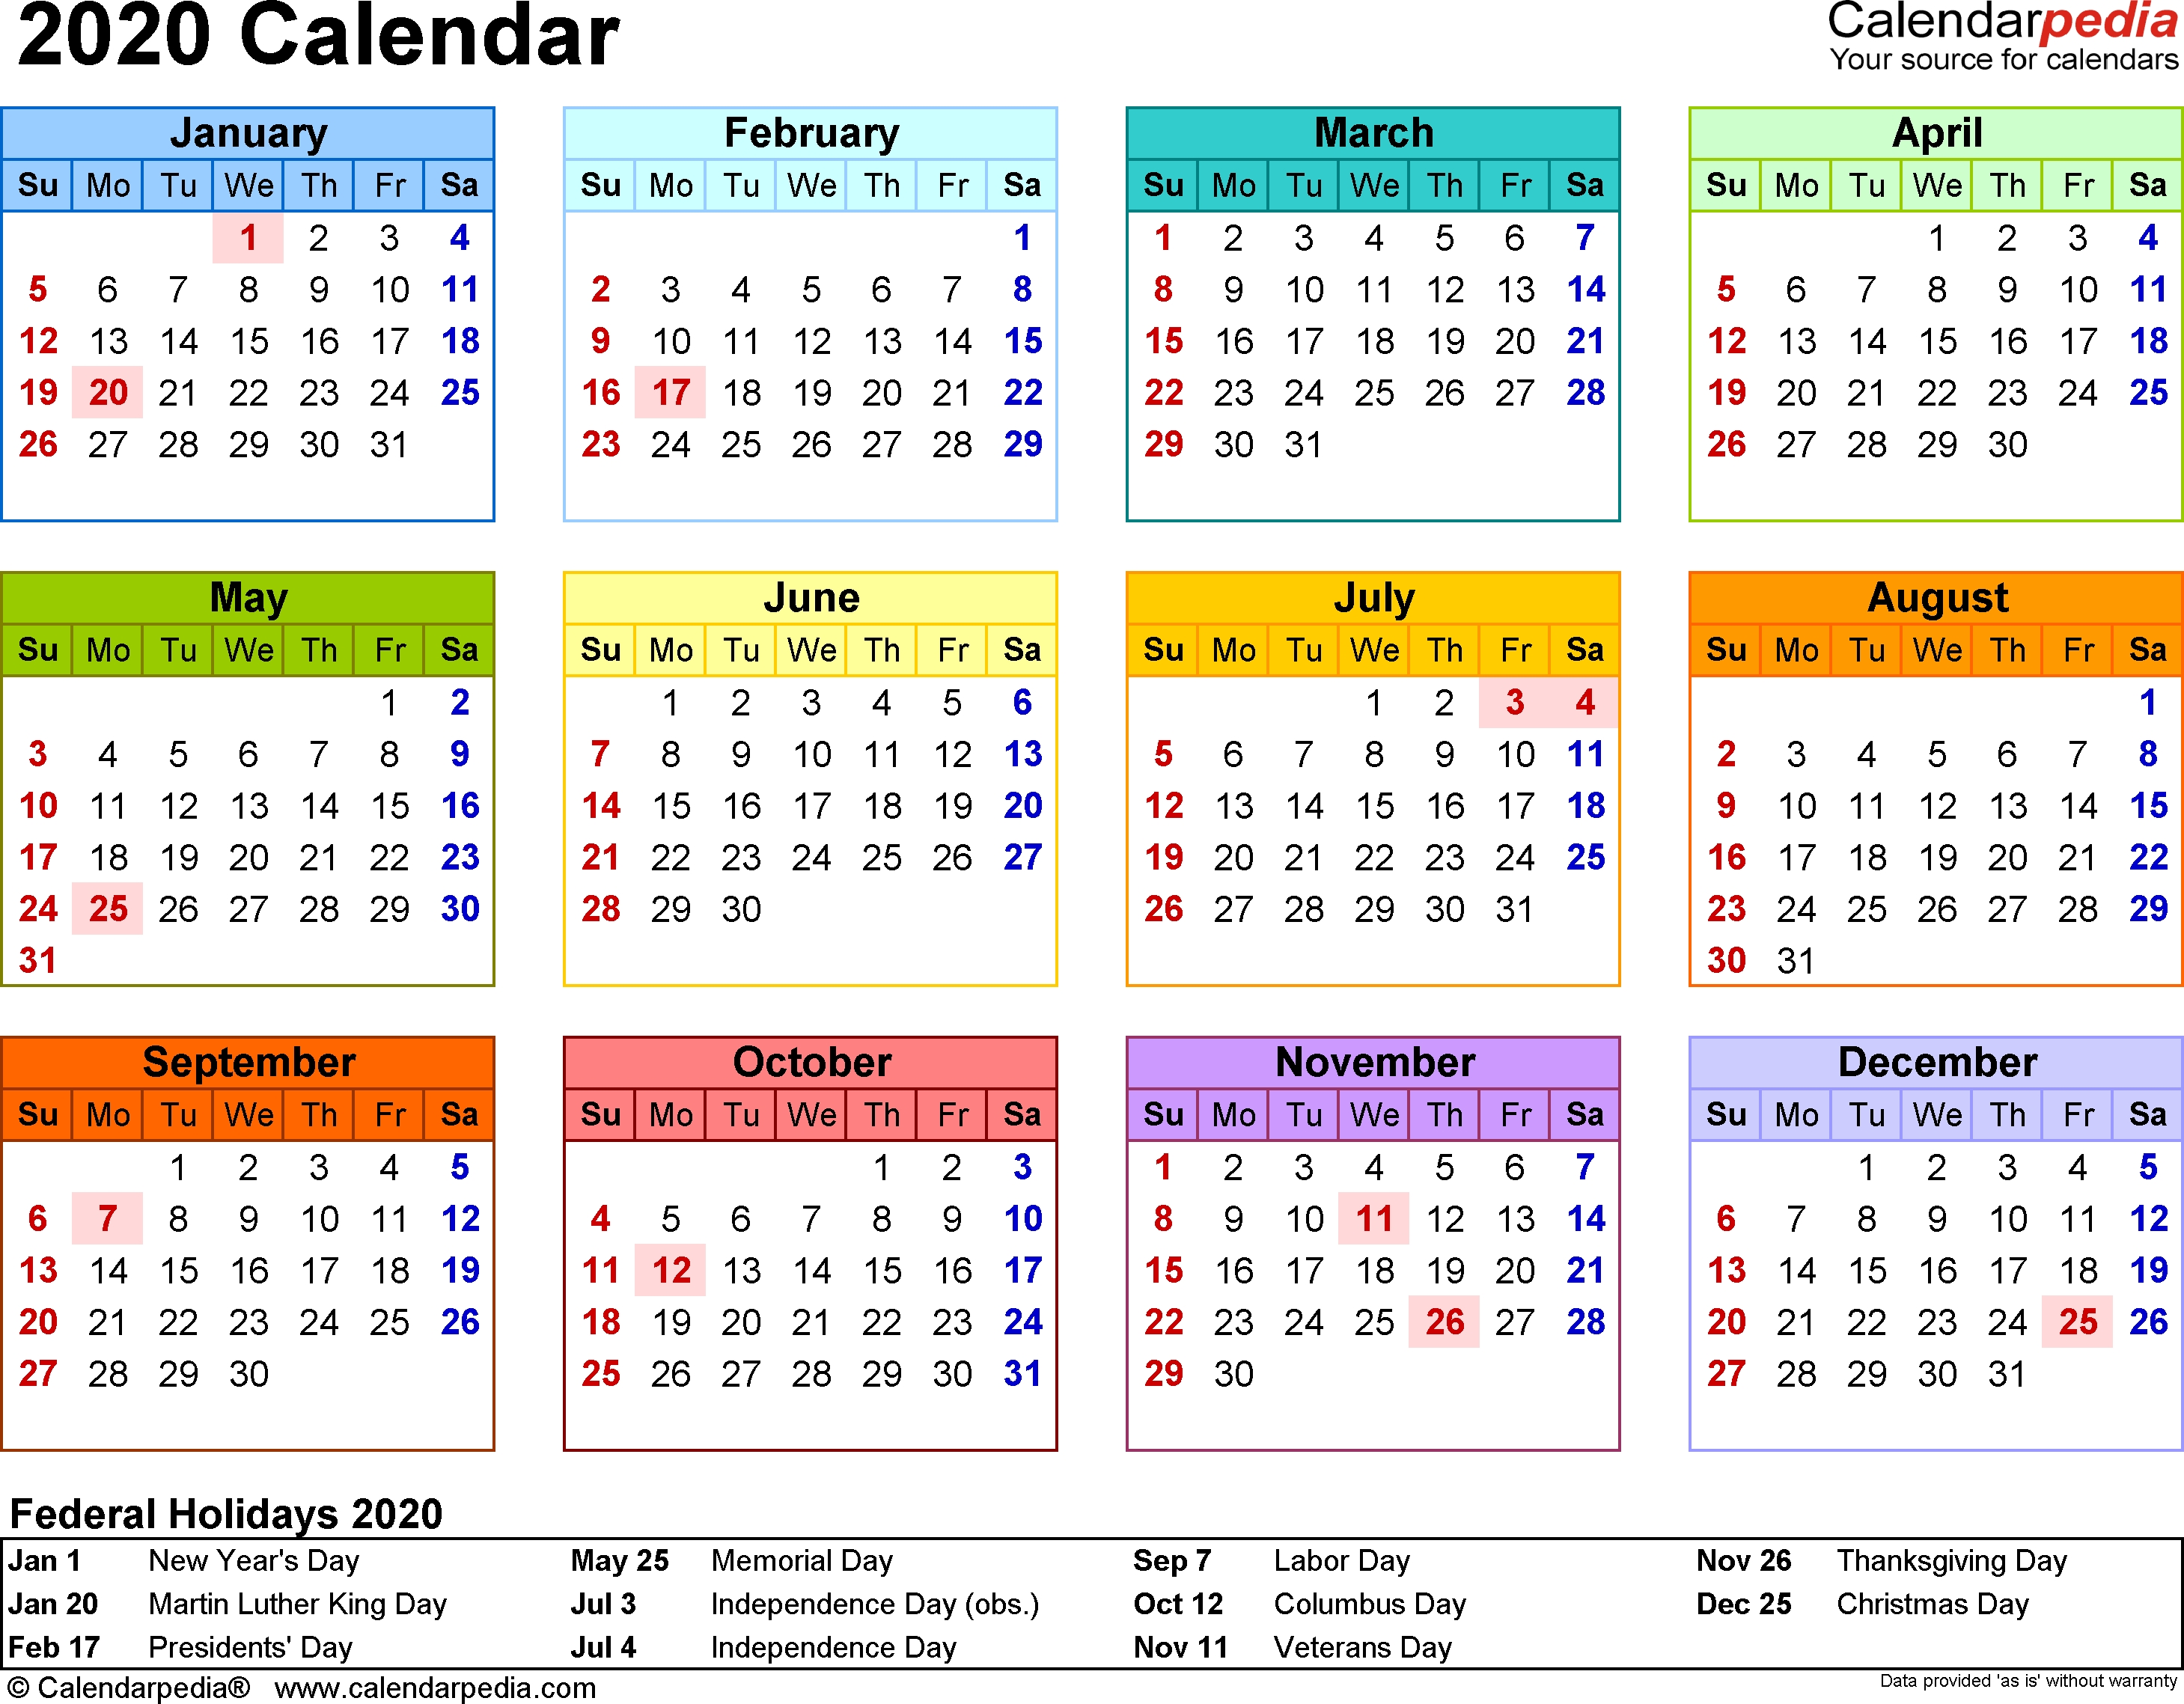 2020 Calendar - Download 17 Free Printable Excel Templates (.xlsx) in 2020 Free Printable Calendar Large Numbers